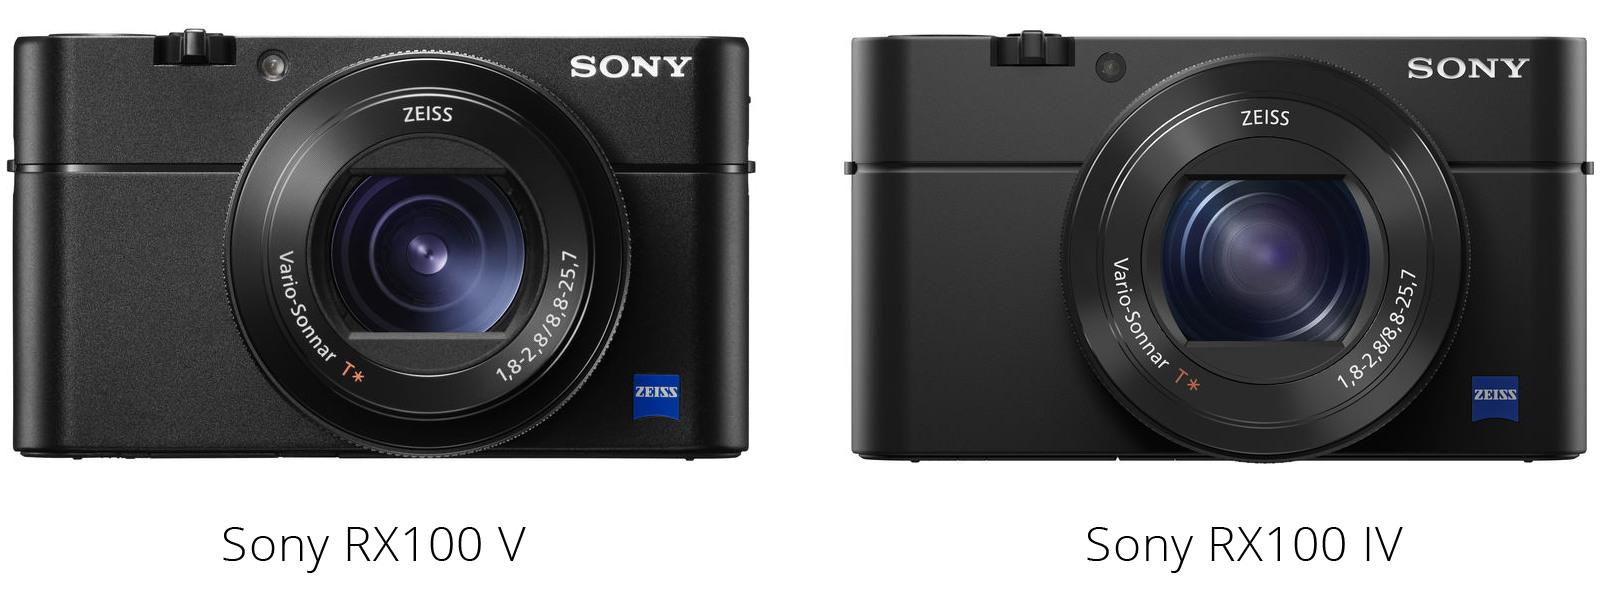 Сравнение Sony RX100 V и Sony RX100 IV